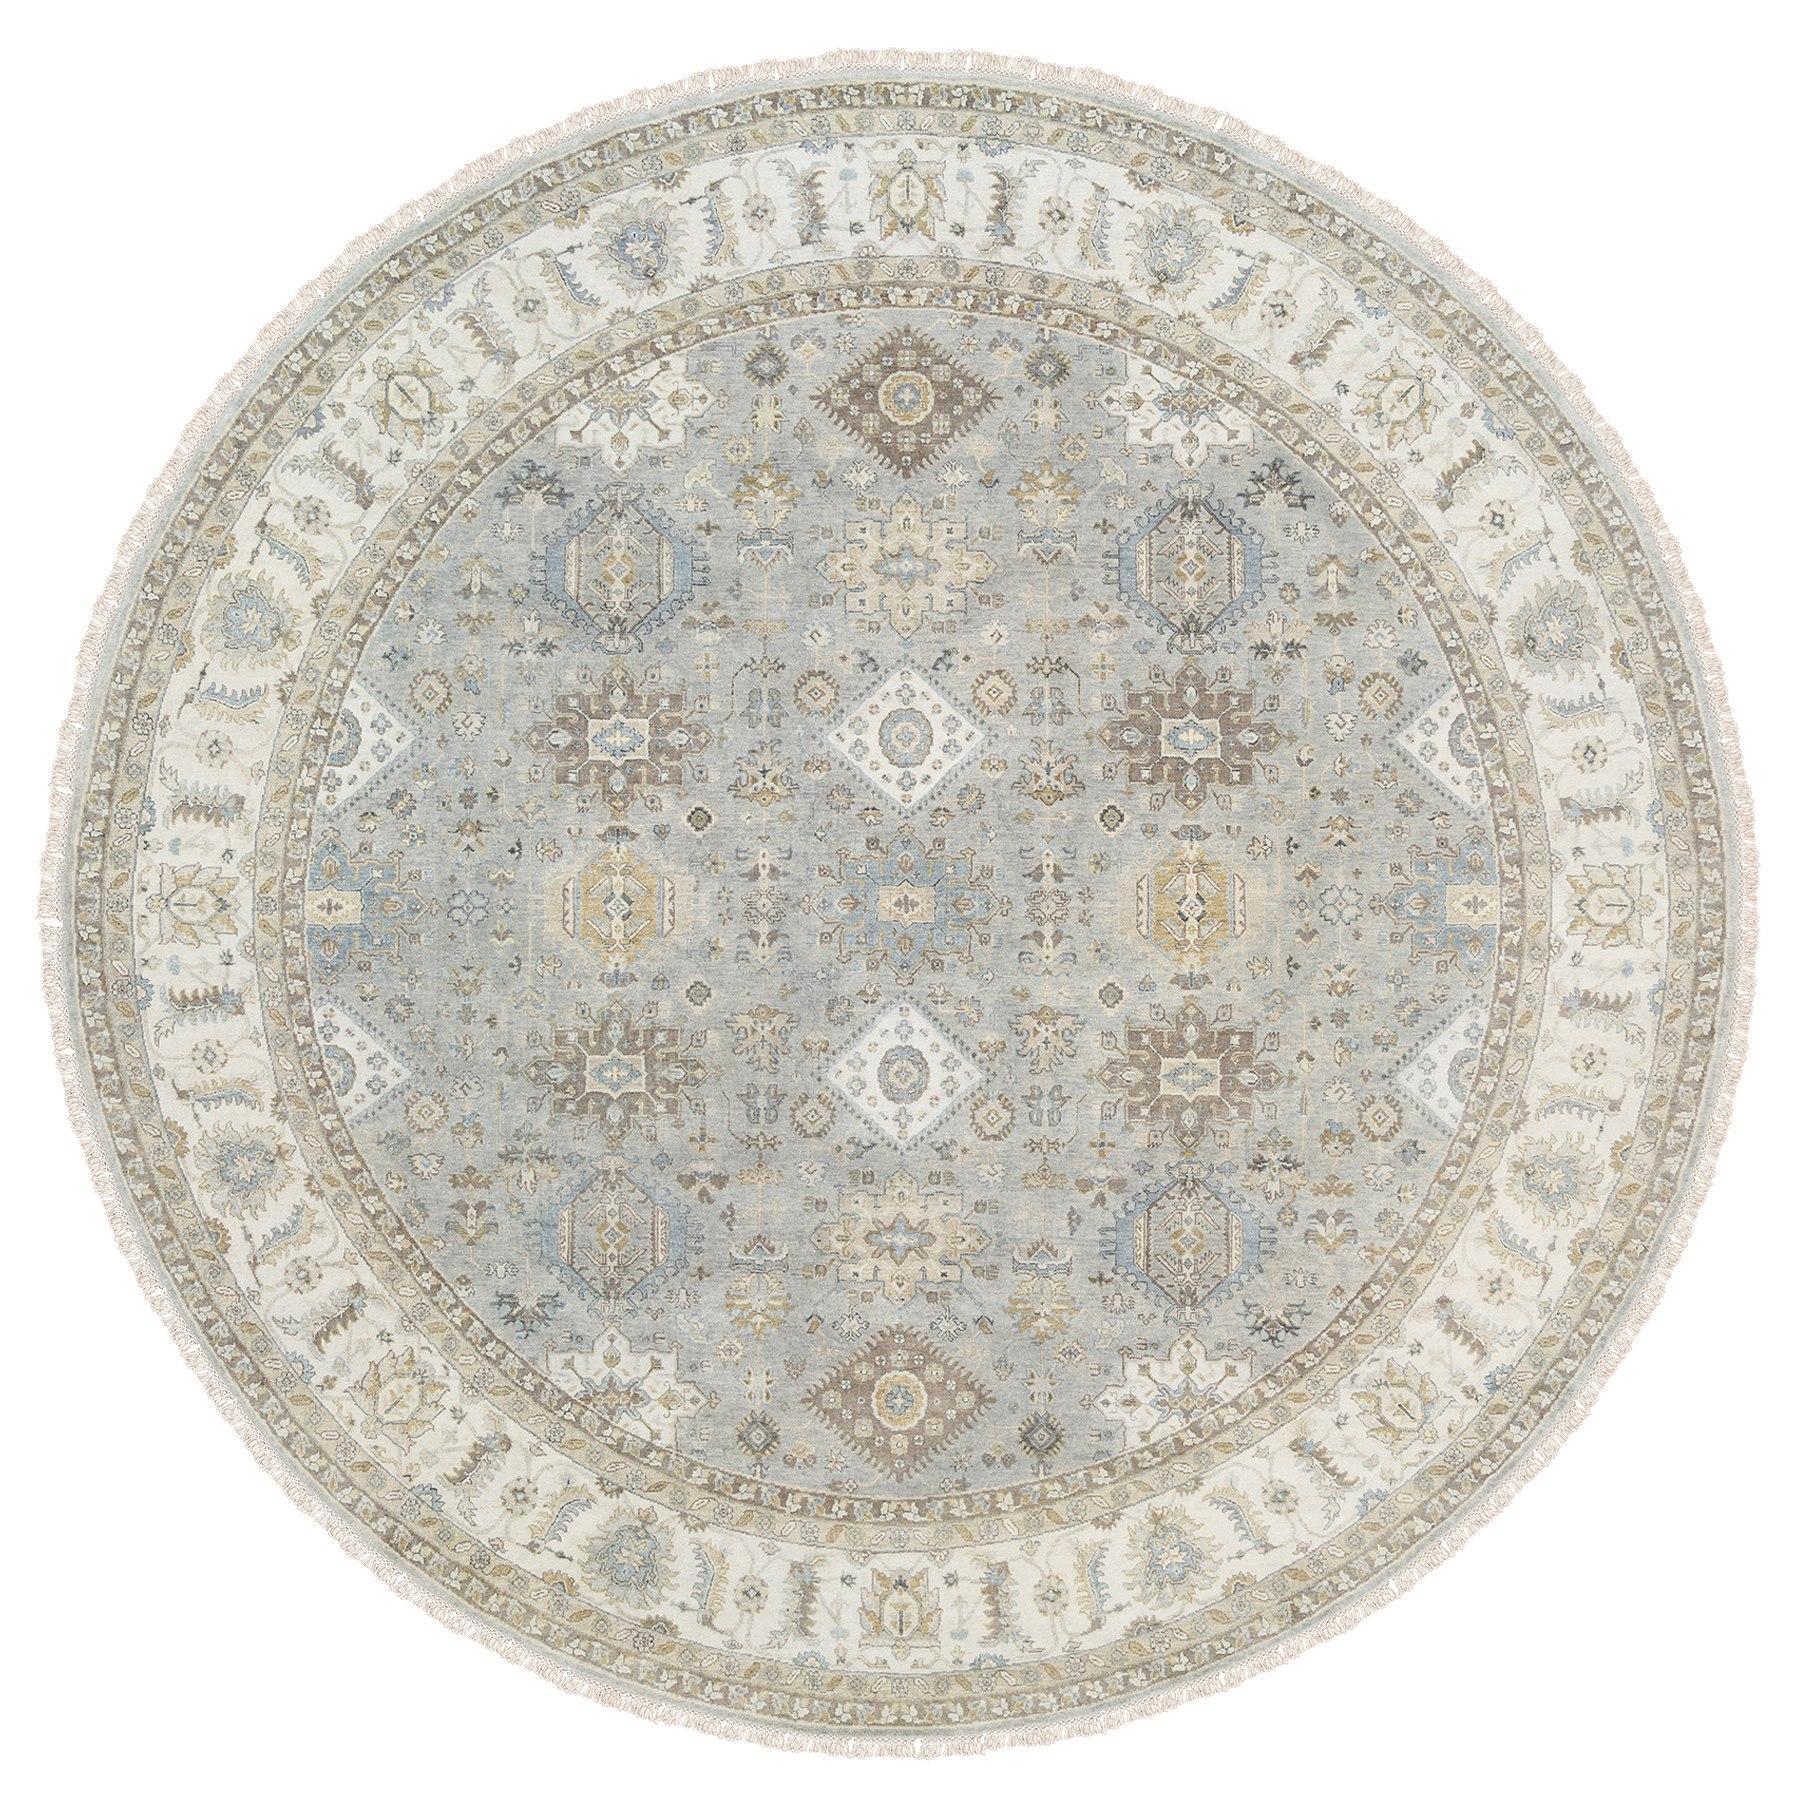 Serapi Heriz and Bakhshayesh Collection Hand Knotted Grey Rug No: 1126138